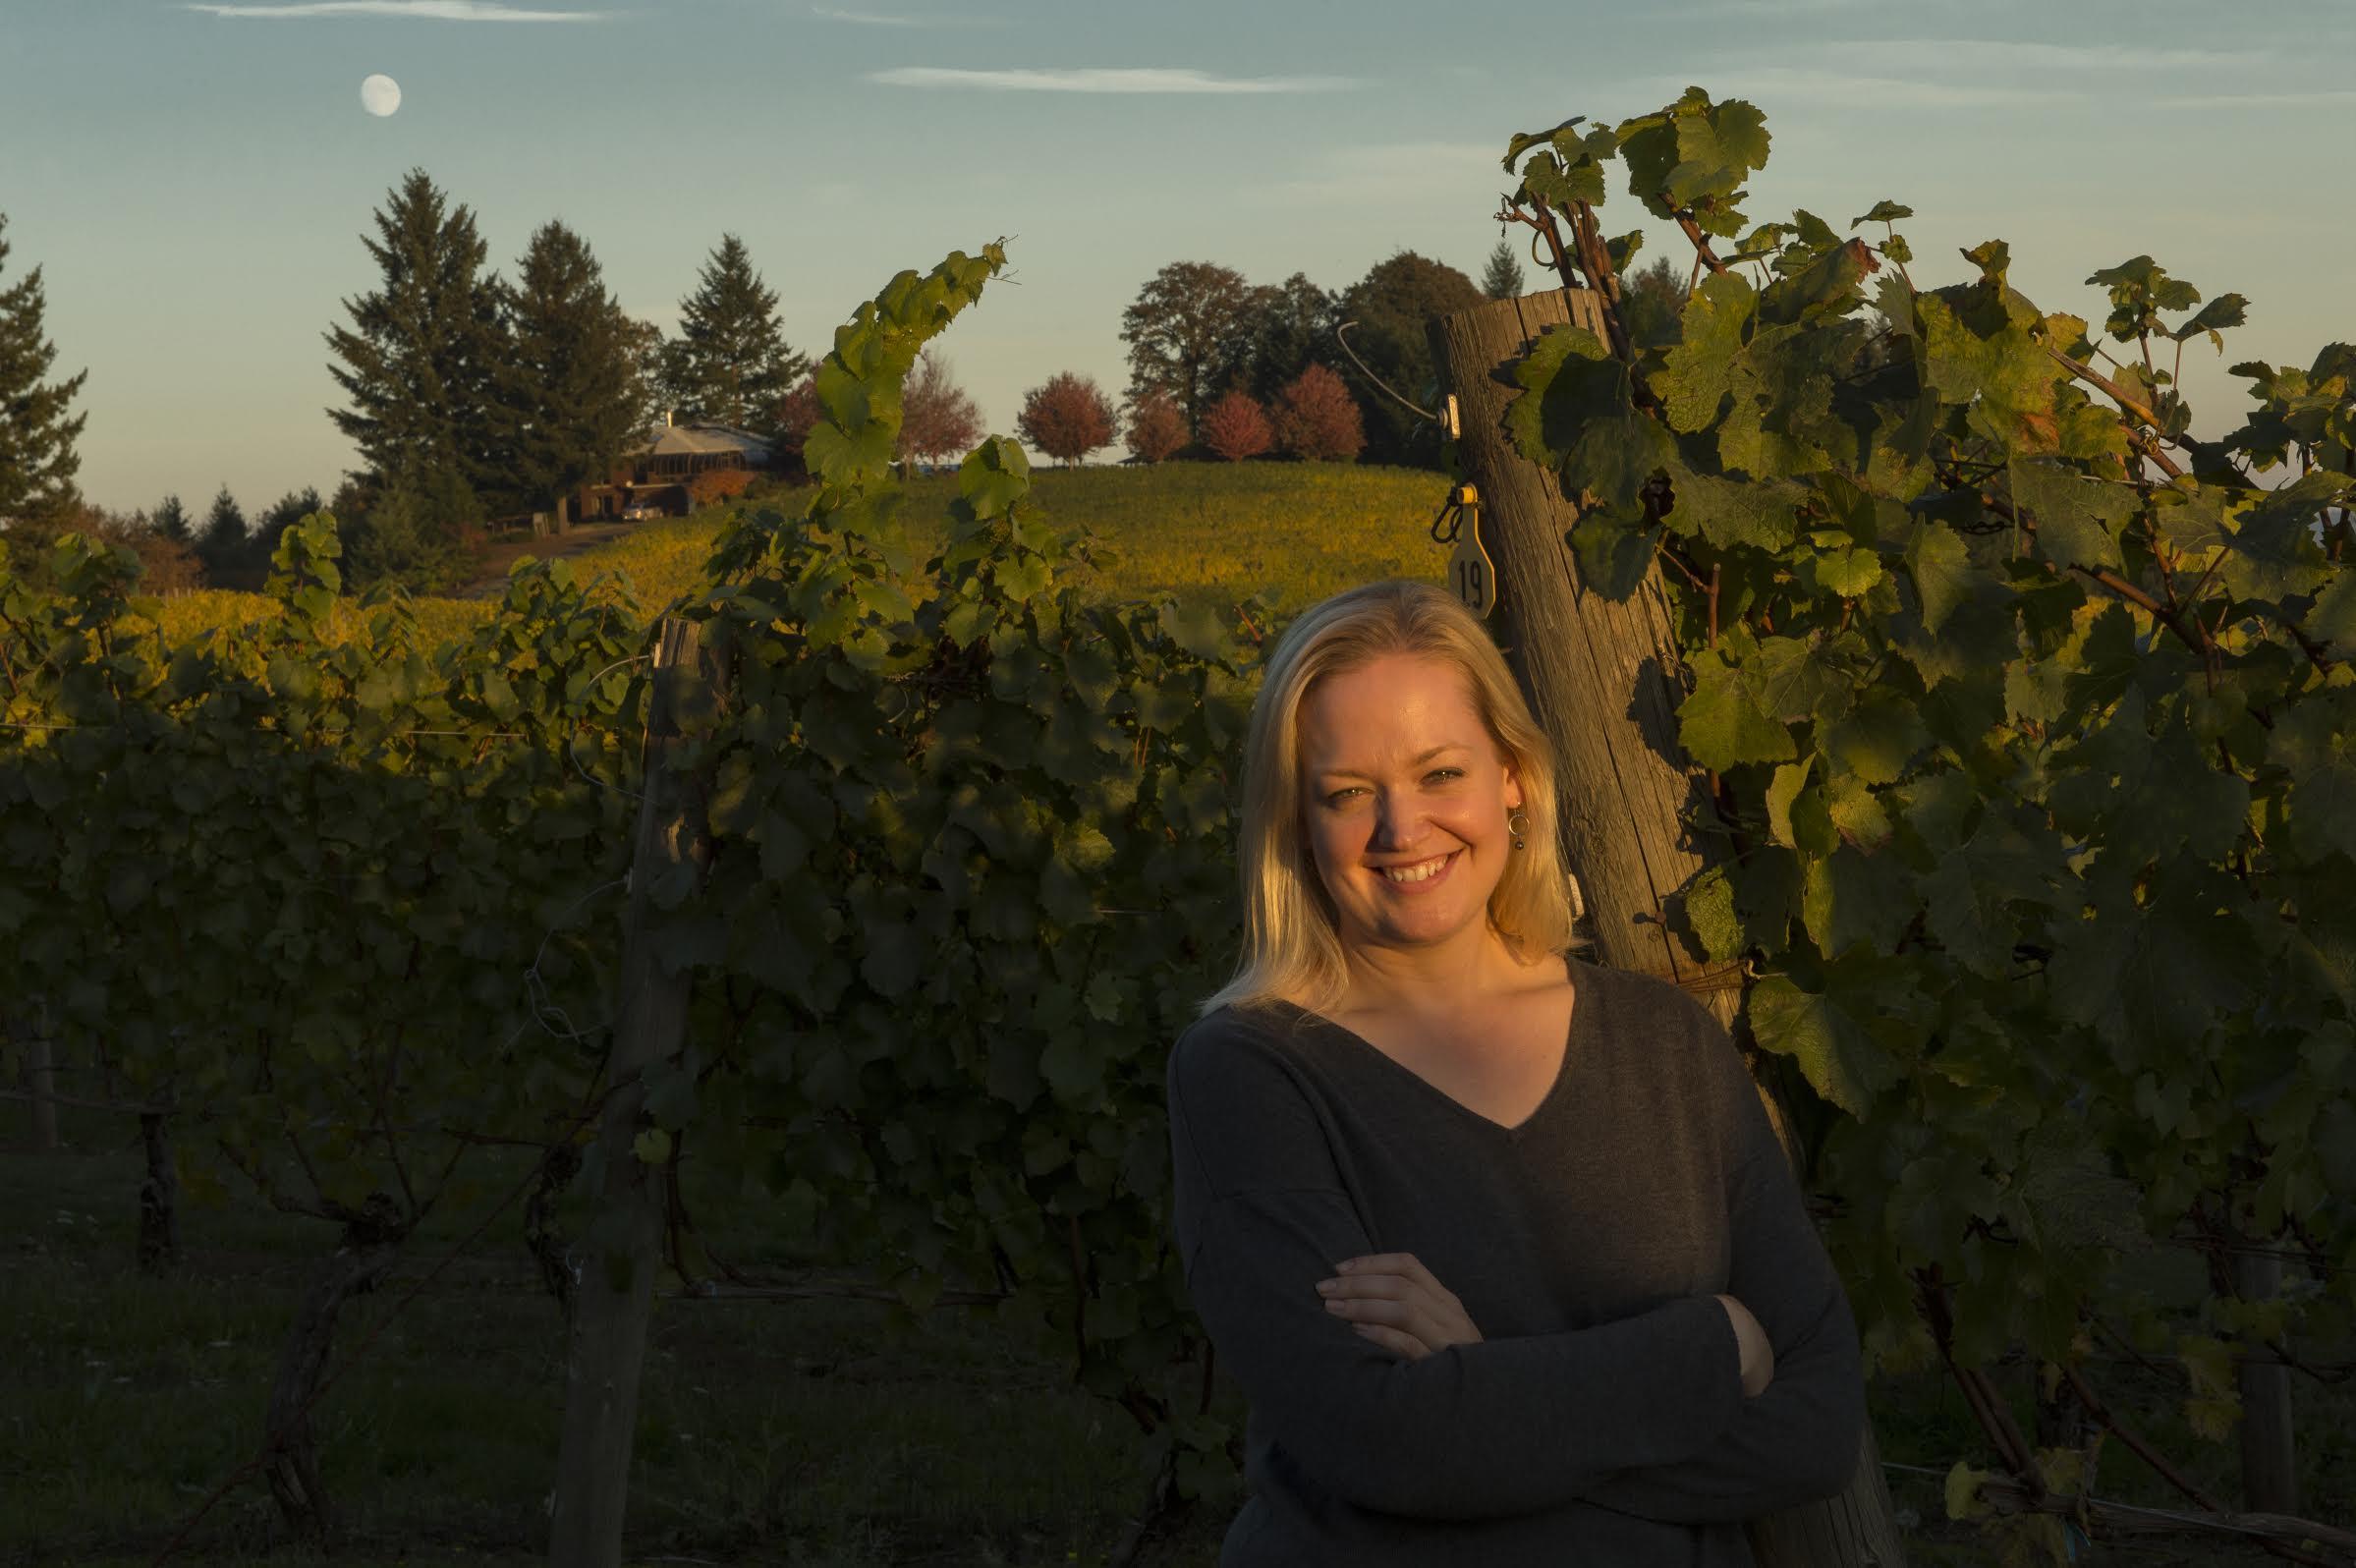 Great photo of Kim Kramer, head winemaker of Kramer Vineyards, in her estate vineyards.